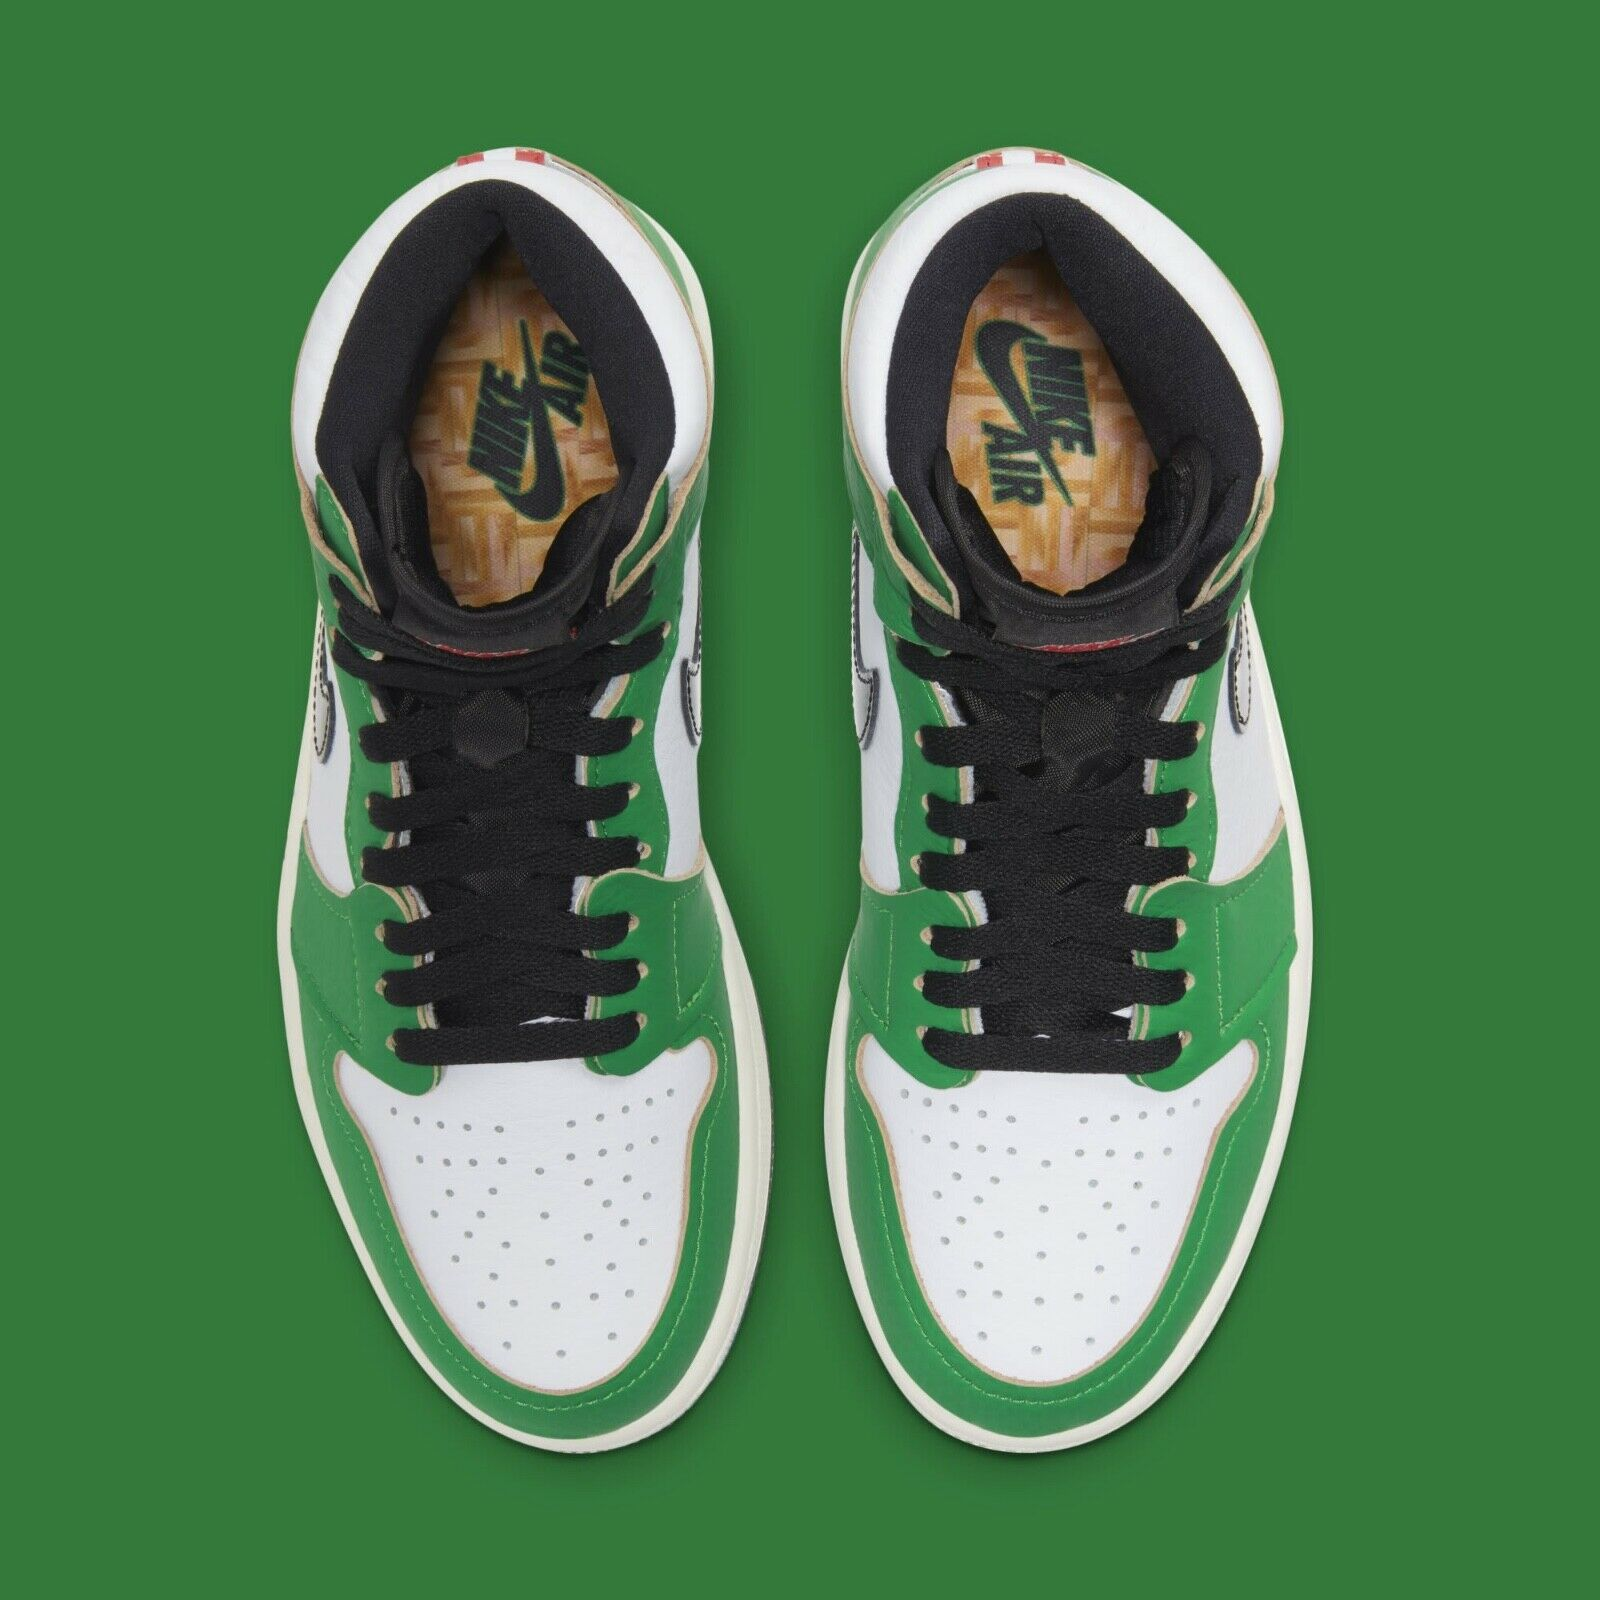 Where To Buy The Air Jordan 1 High OG Lucky Green DB4612-300